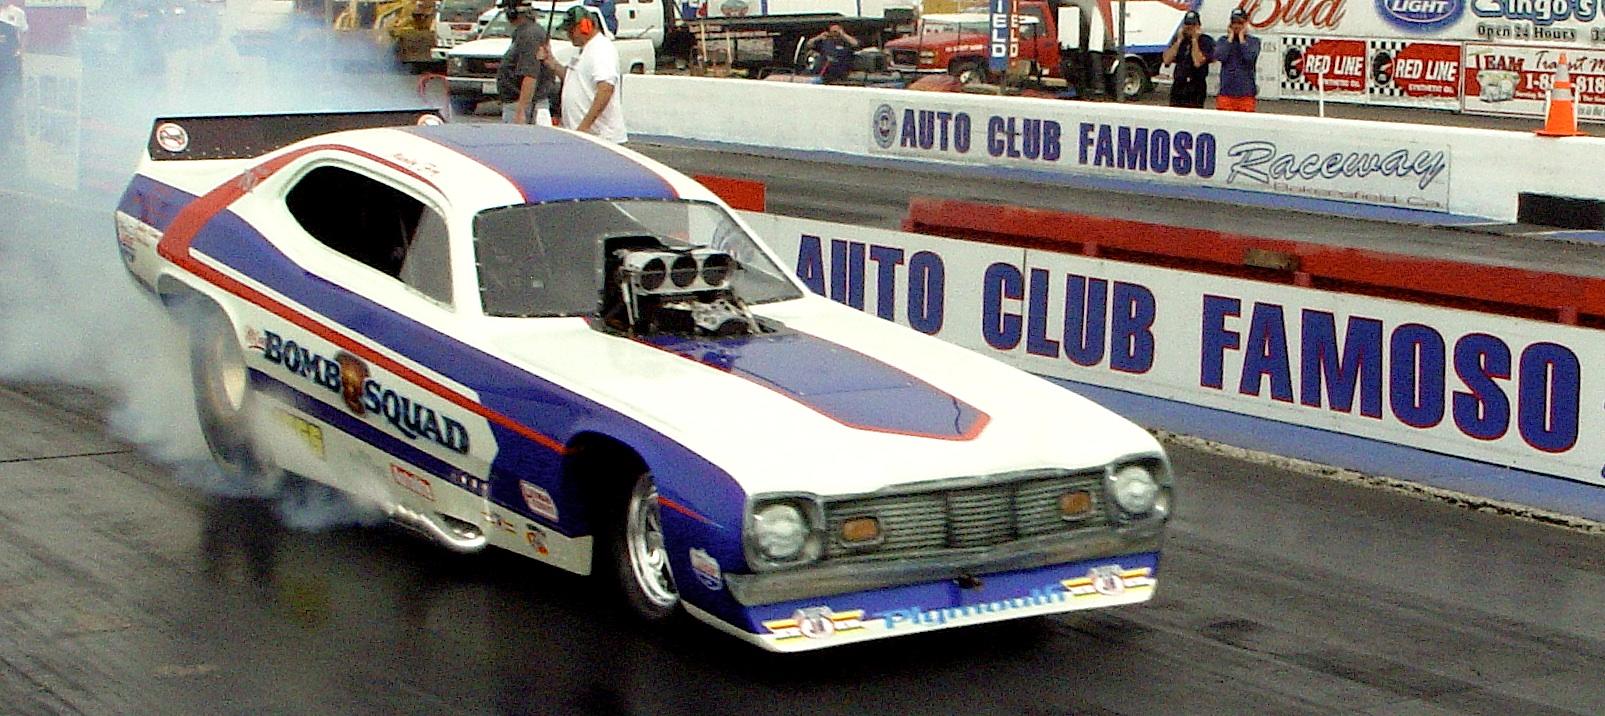 Famoso Raceway   Mendy Fry's Nitro Kitty Blog